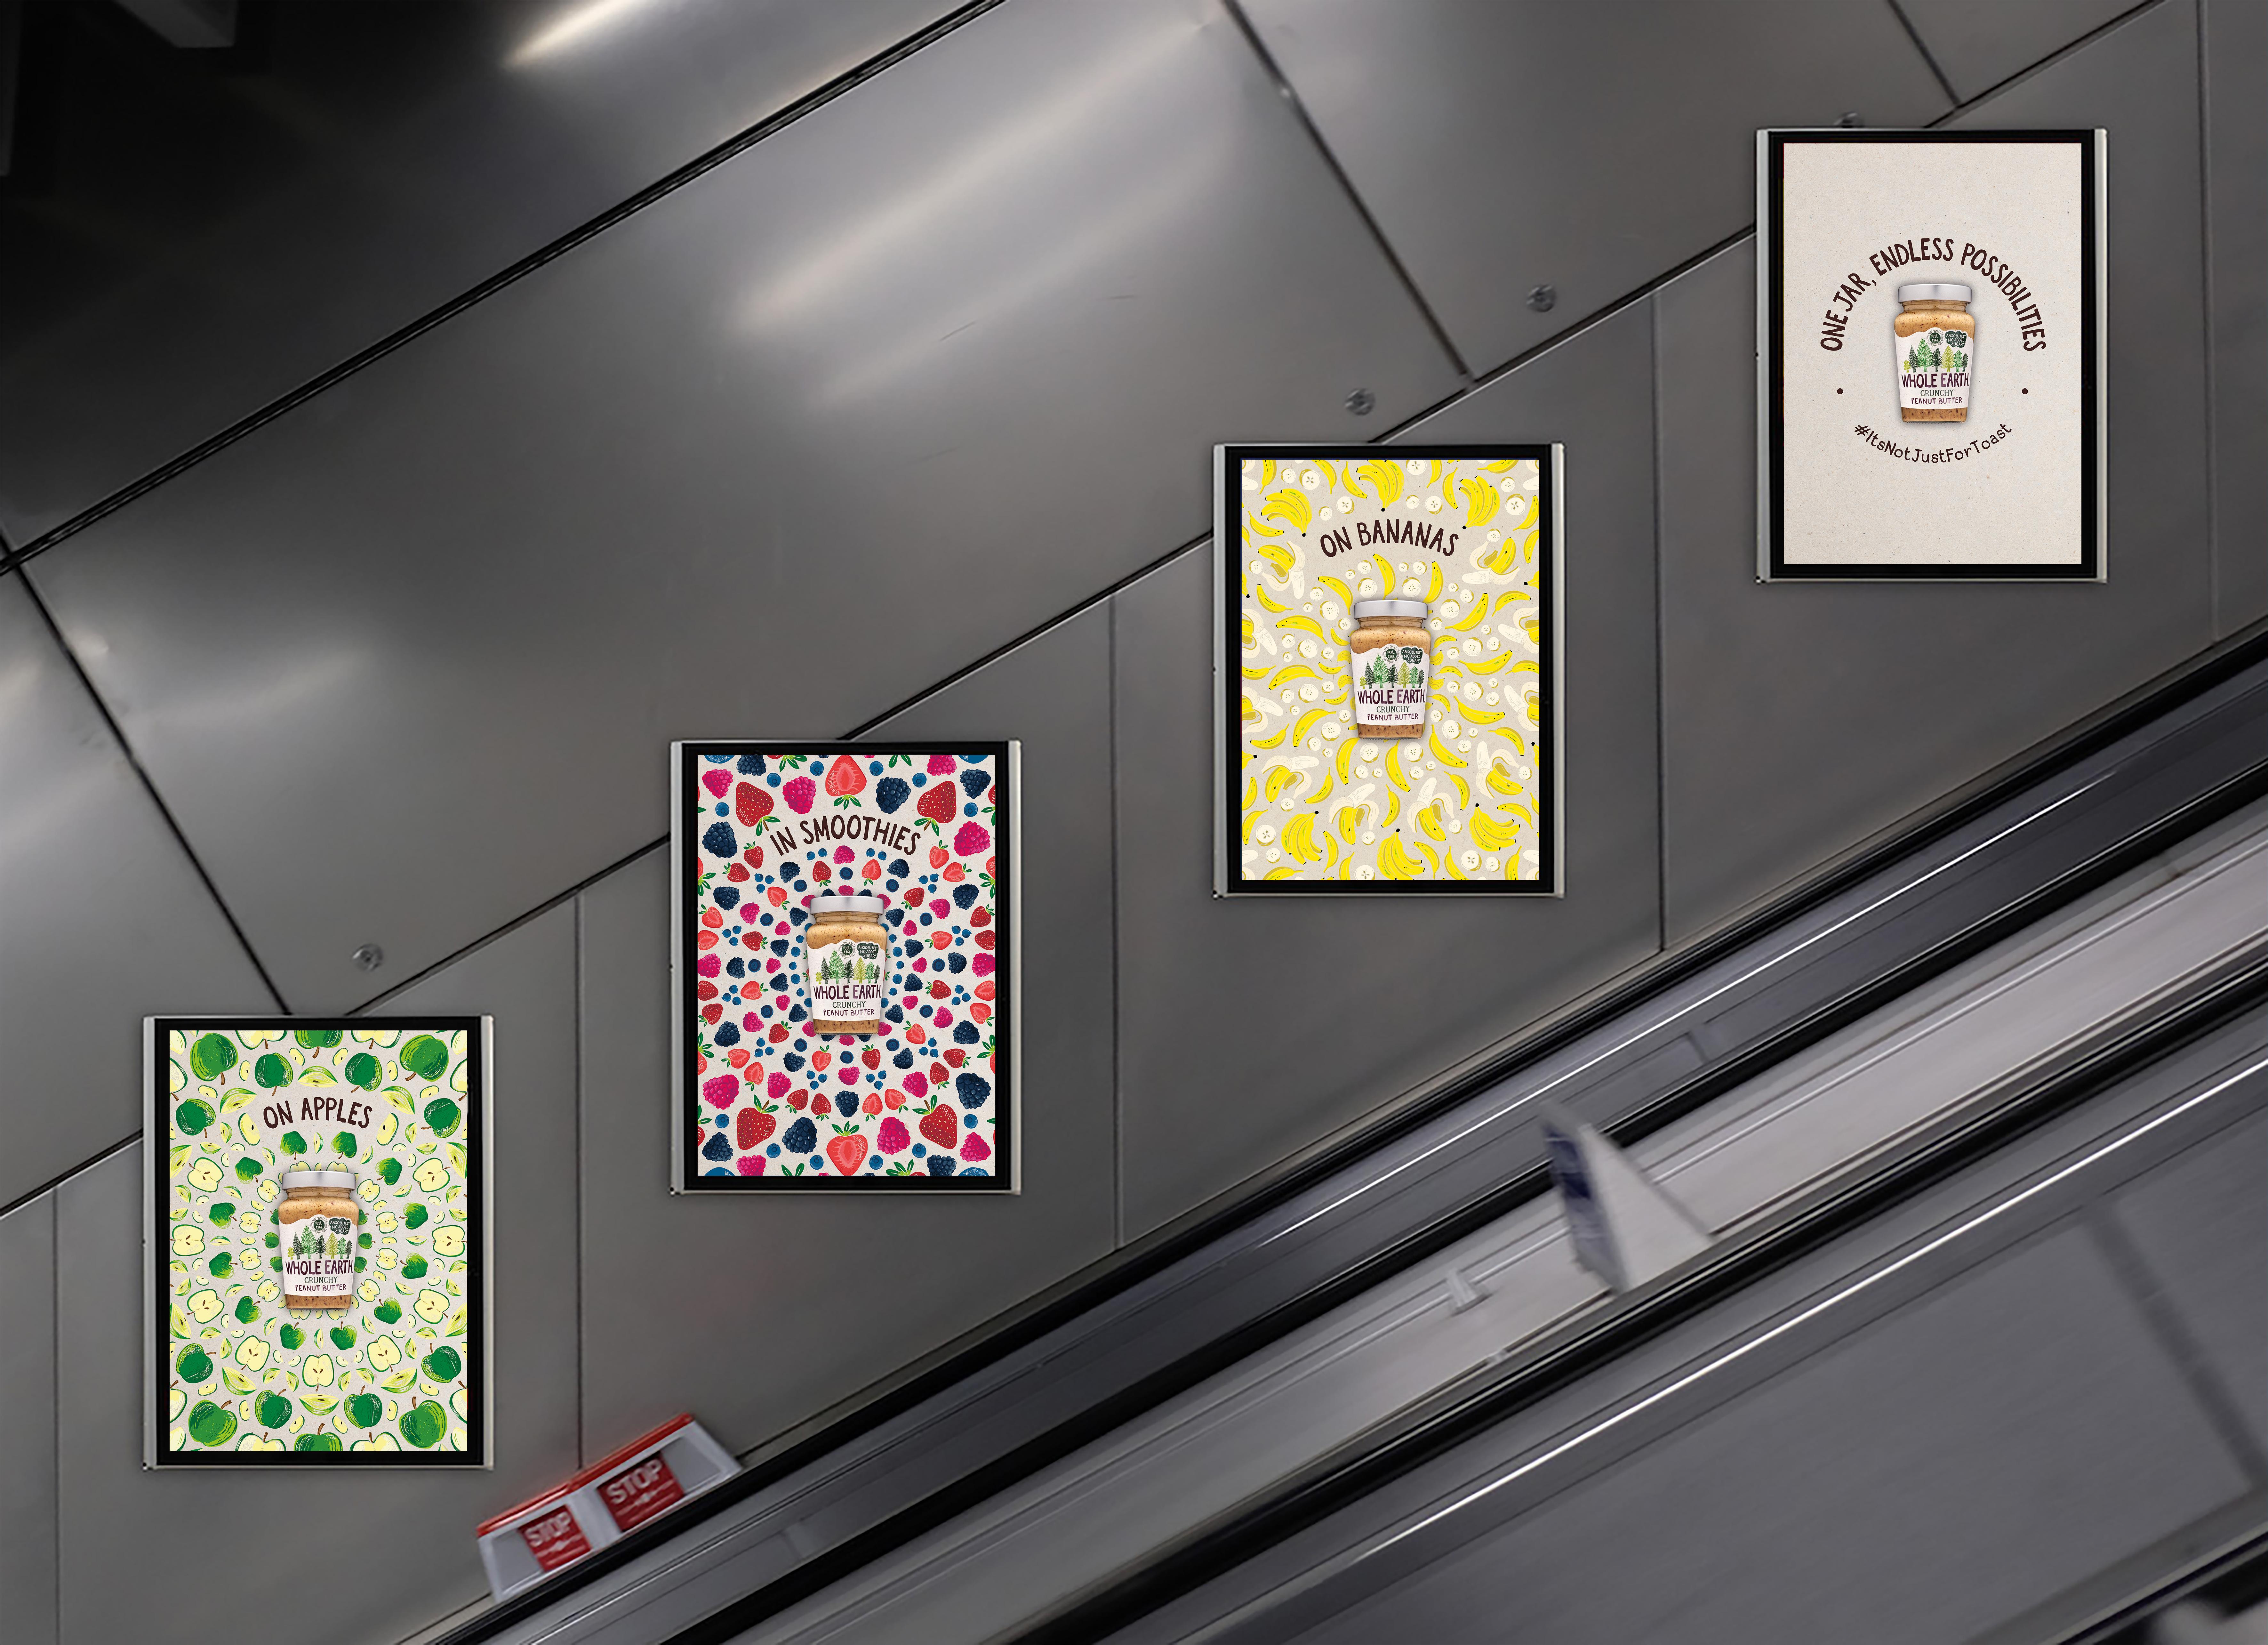 Whole Earth - One jar, endless possibilities (tube escalator) hi res.jpg